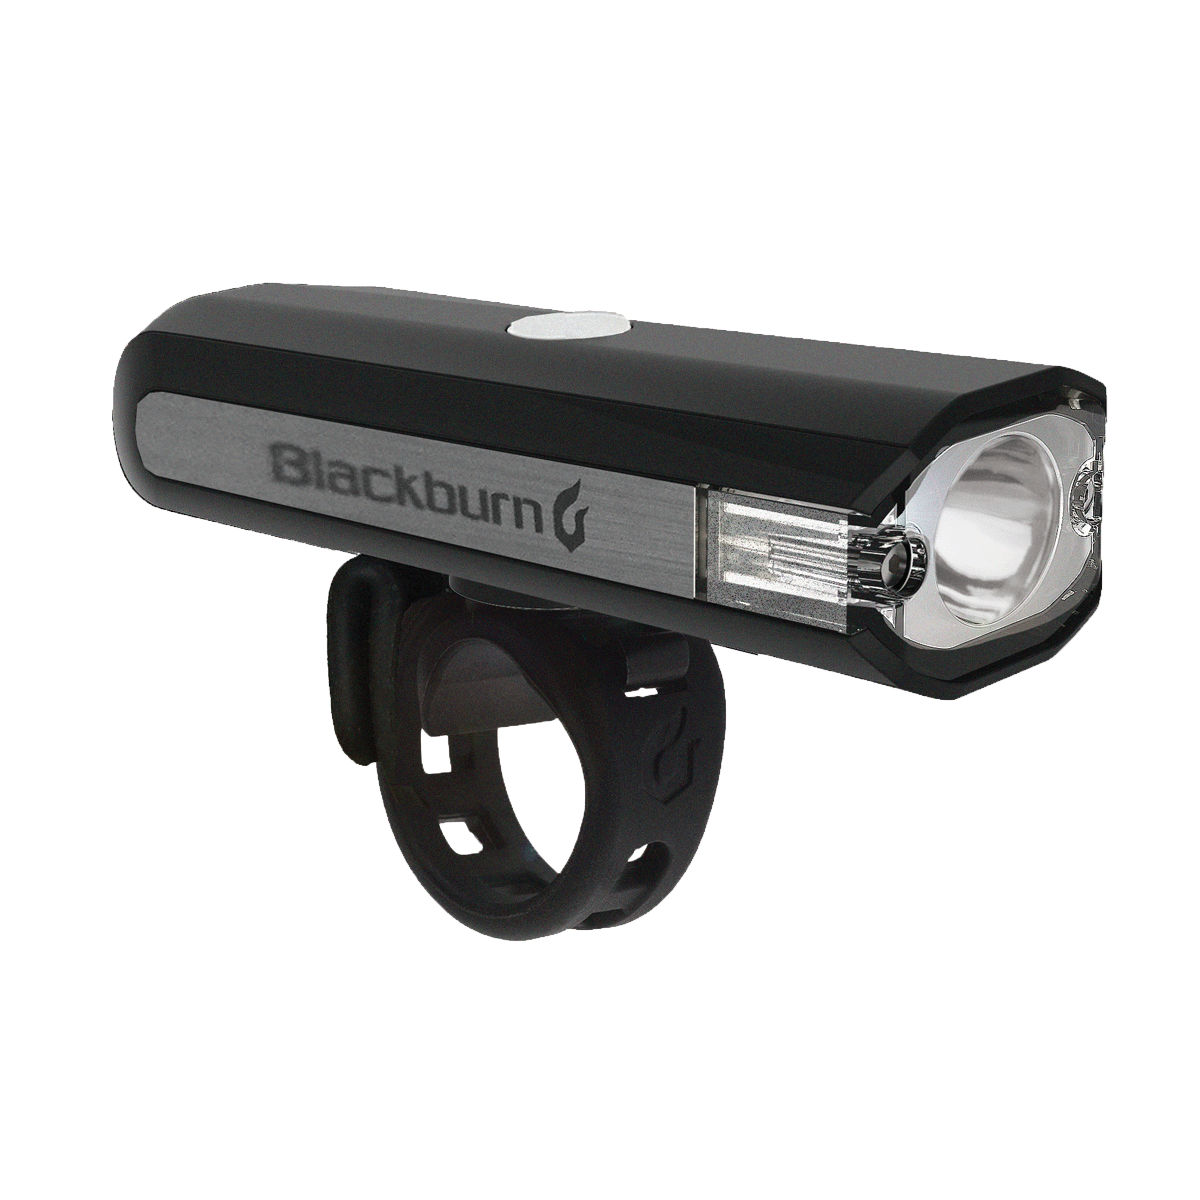 Blackburn Central 350 Micro Rechargeable Front Bike Light